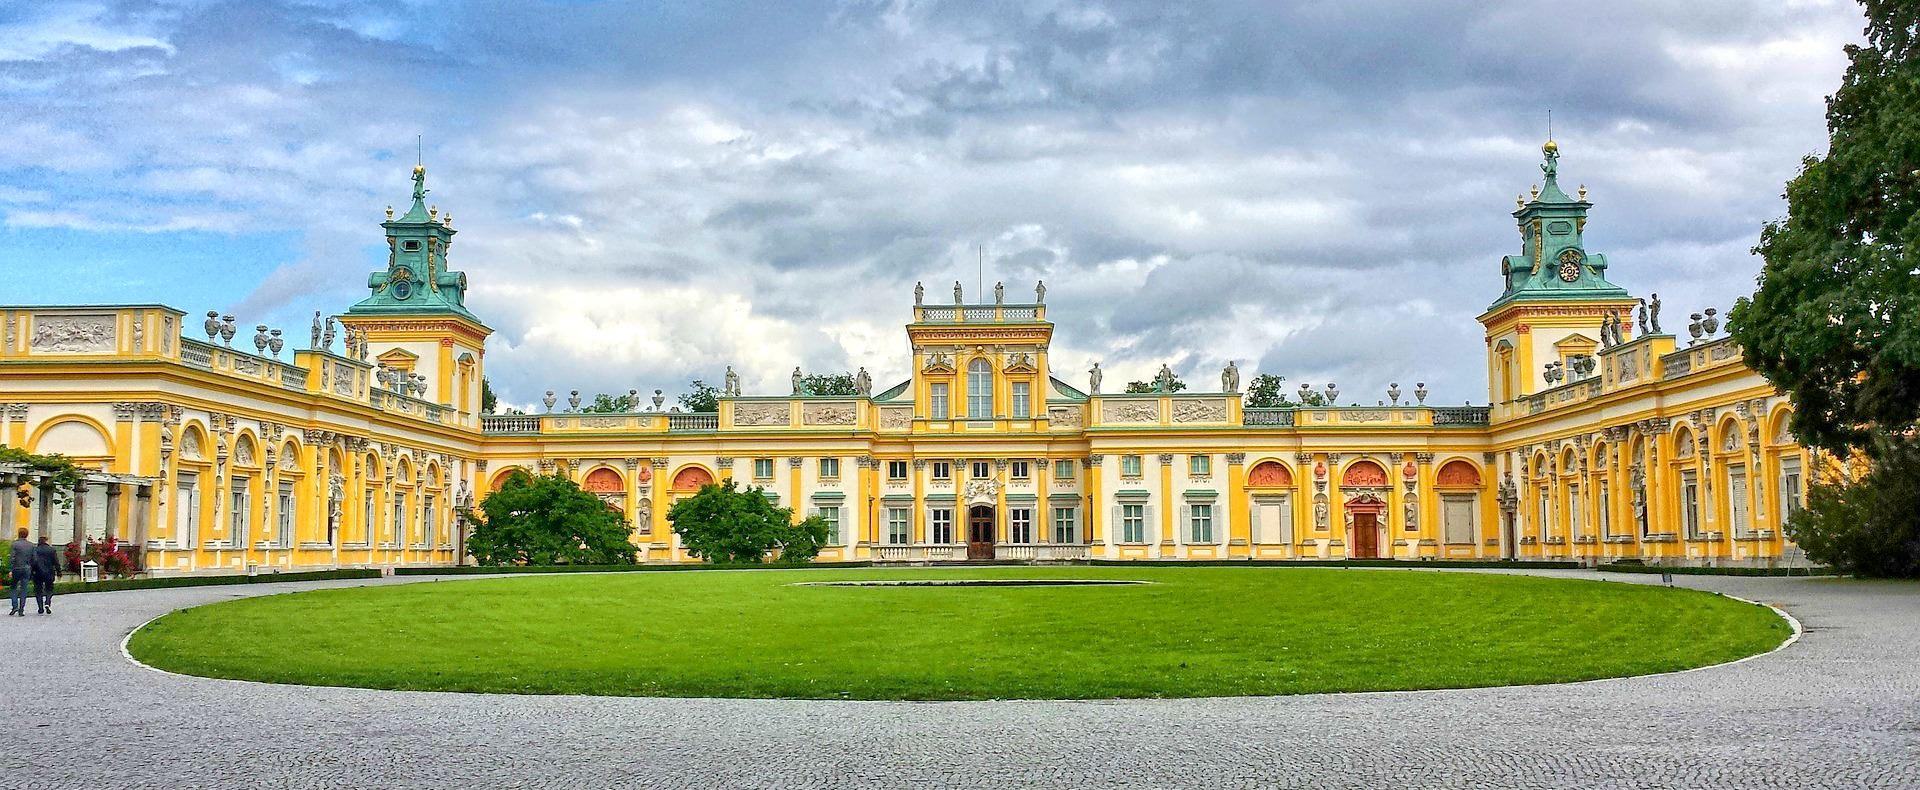 Warsaw, Wilanow Palace